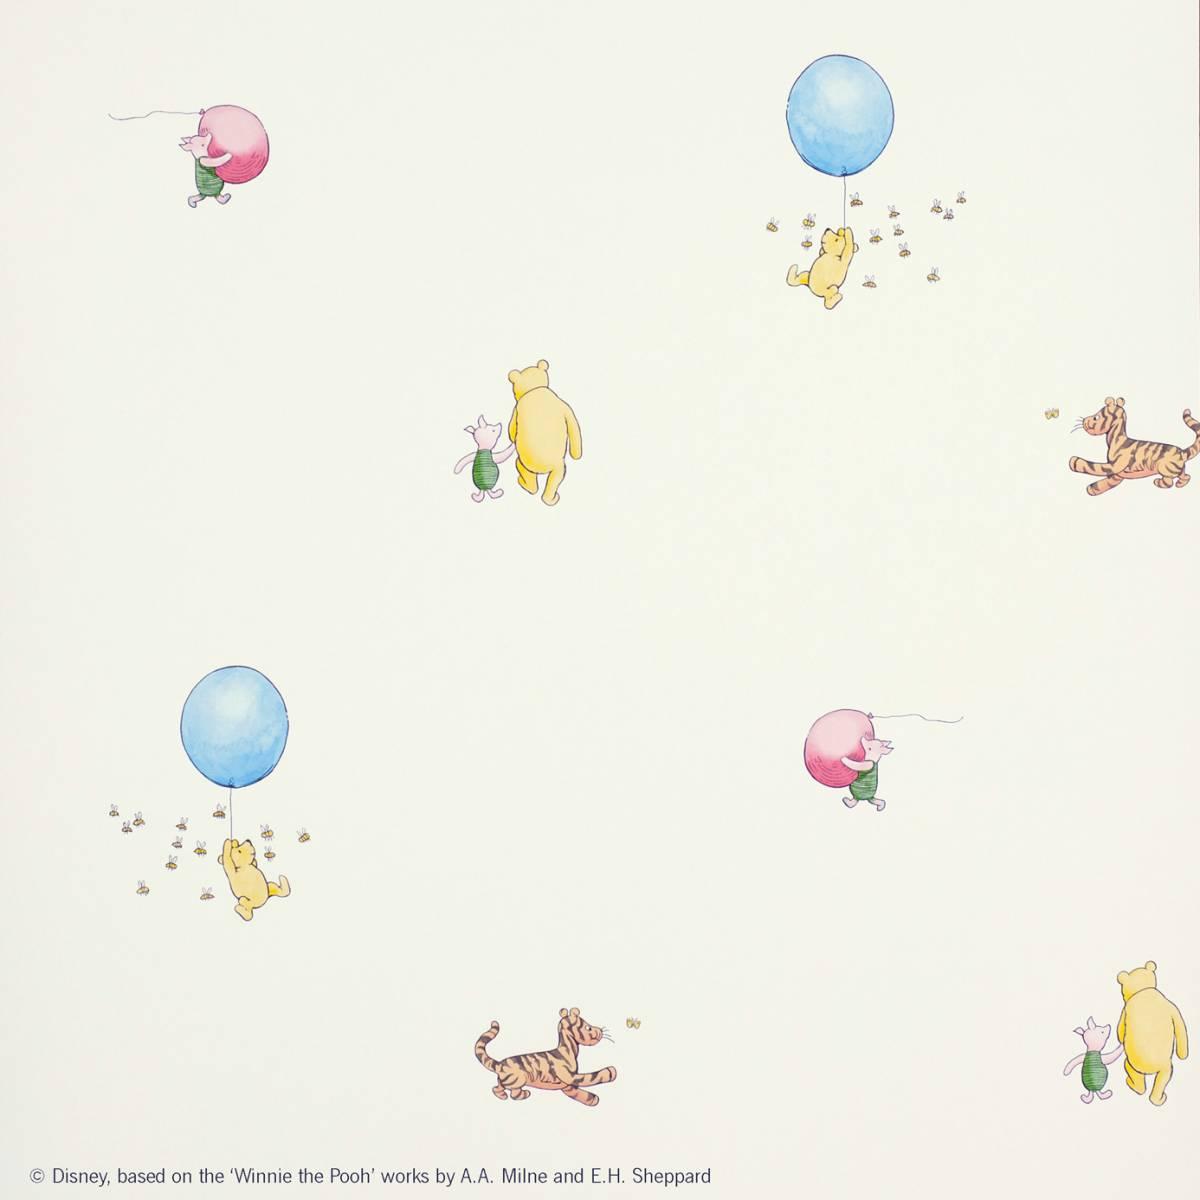 Wallpaper Winnie The Pooh: Winnie The Pooh Balloon Wallpaper